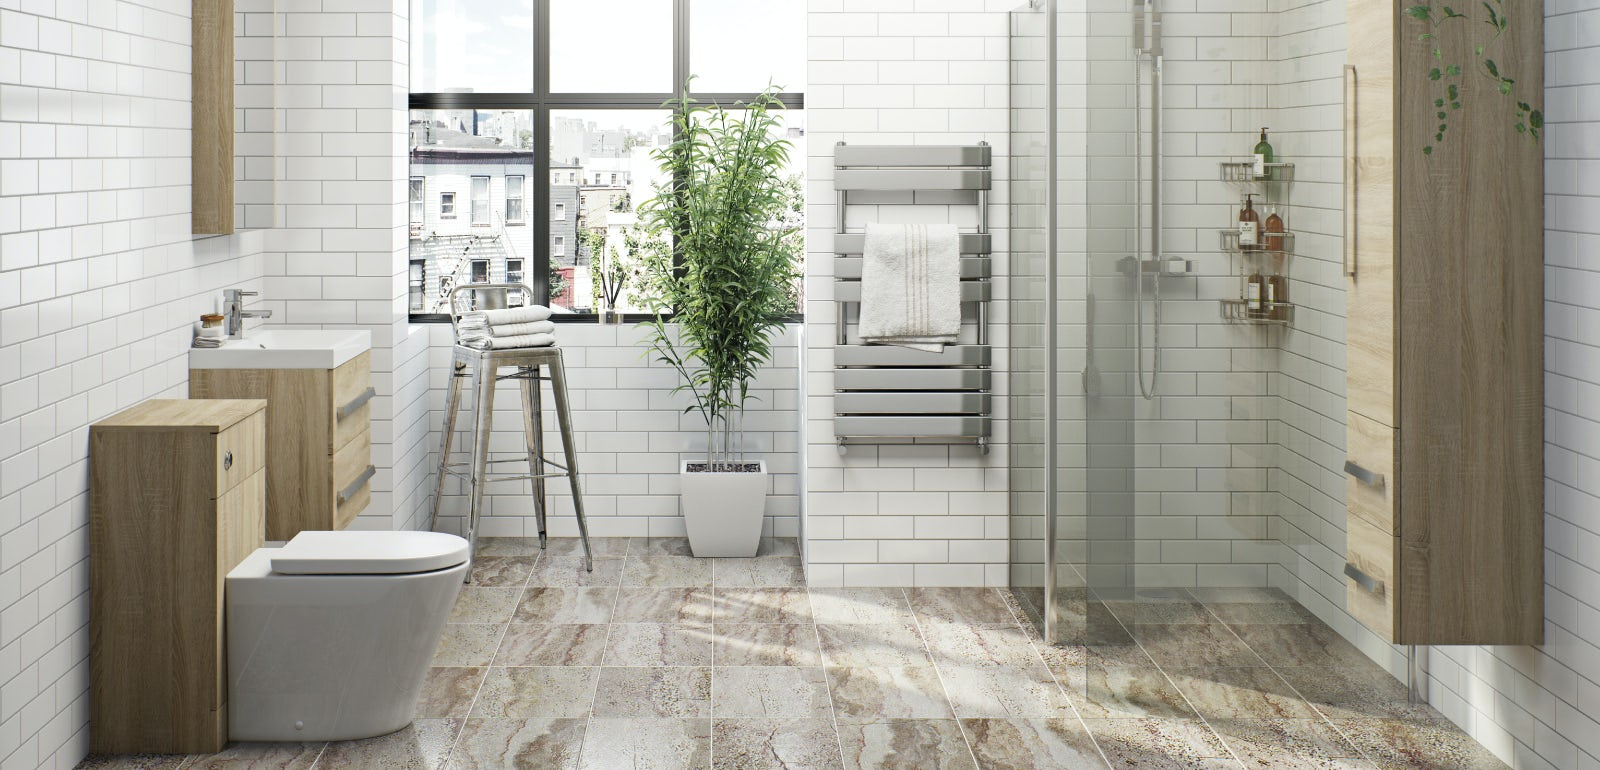 6 Clever Bathroom Storage Ideas